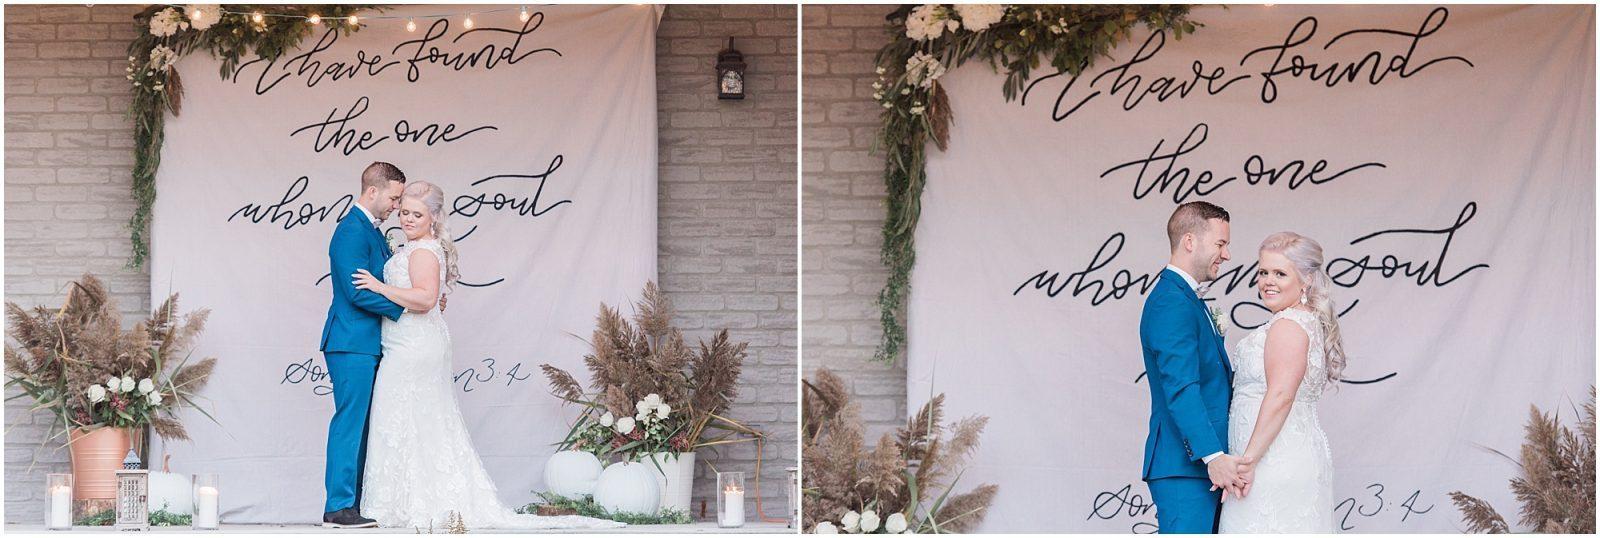 0076 Bethany and Luc - Fall Backyard Ottawa Wedding - Copper and Navy - PhotosbyEmmaH.jpg